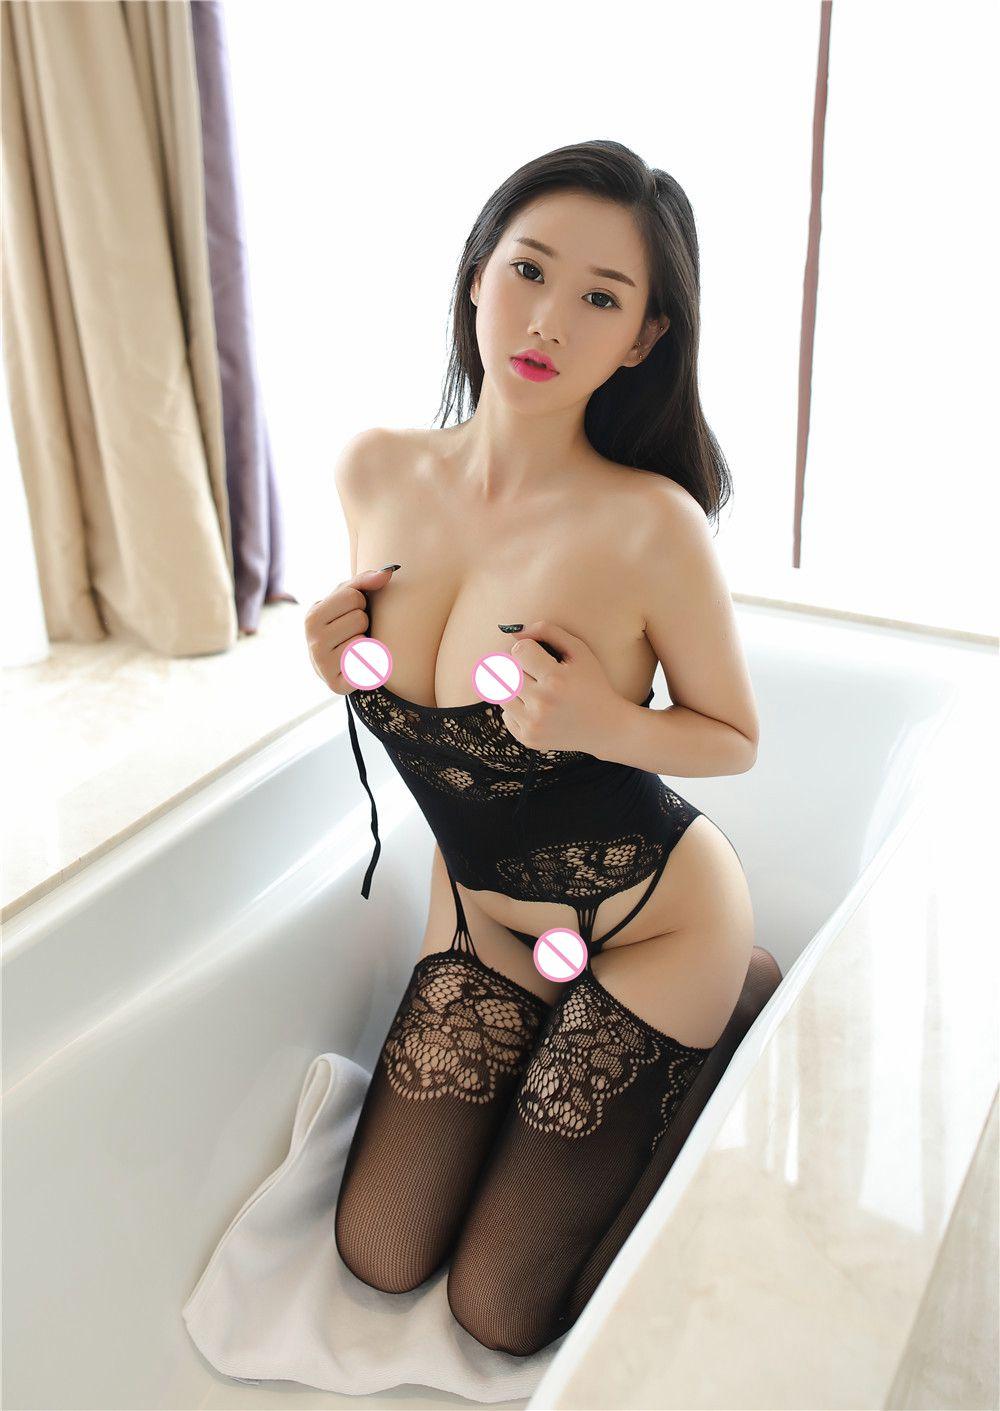 New Women Sexy Lingerie Plus Size Hot Erotic Underwear Babydoll Fishnet Sleepwear exy Costumes Lenceria Erotica Mujer Sexi